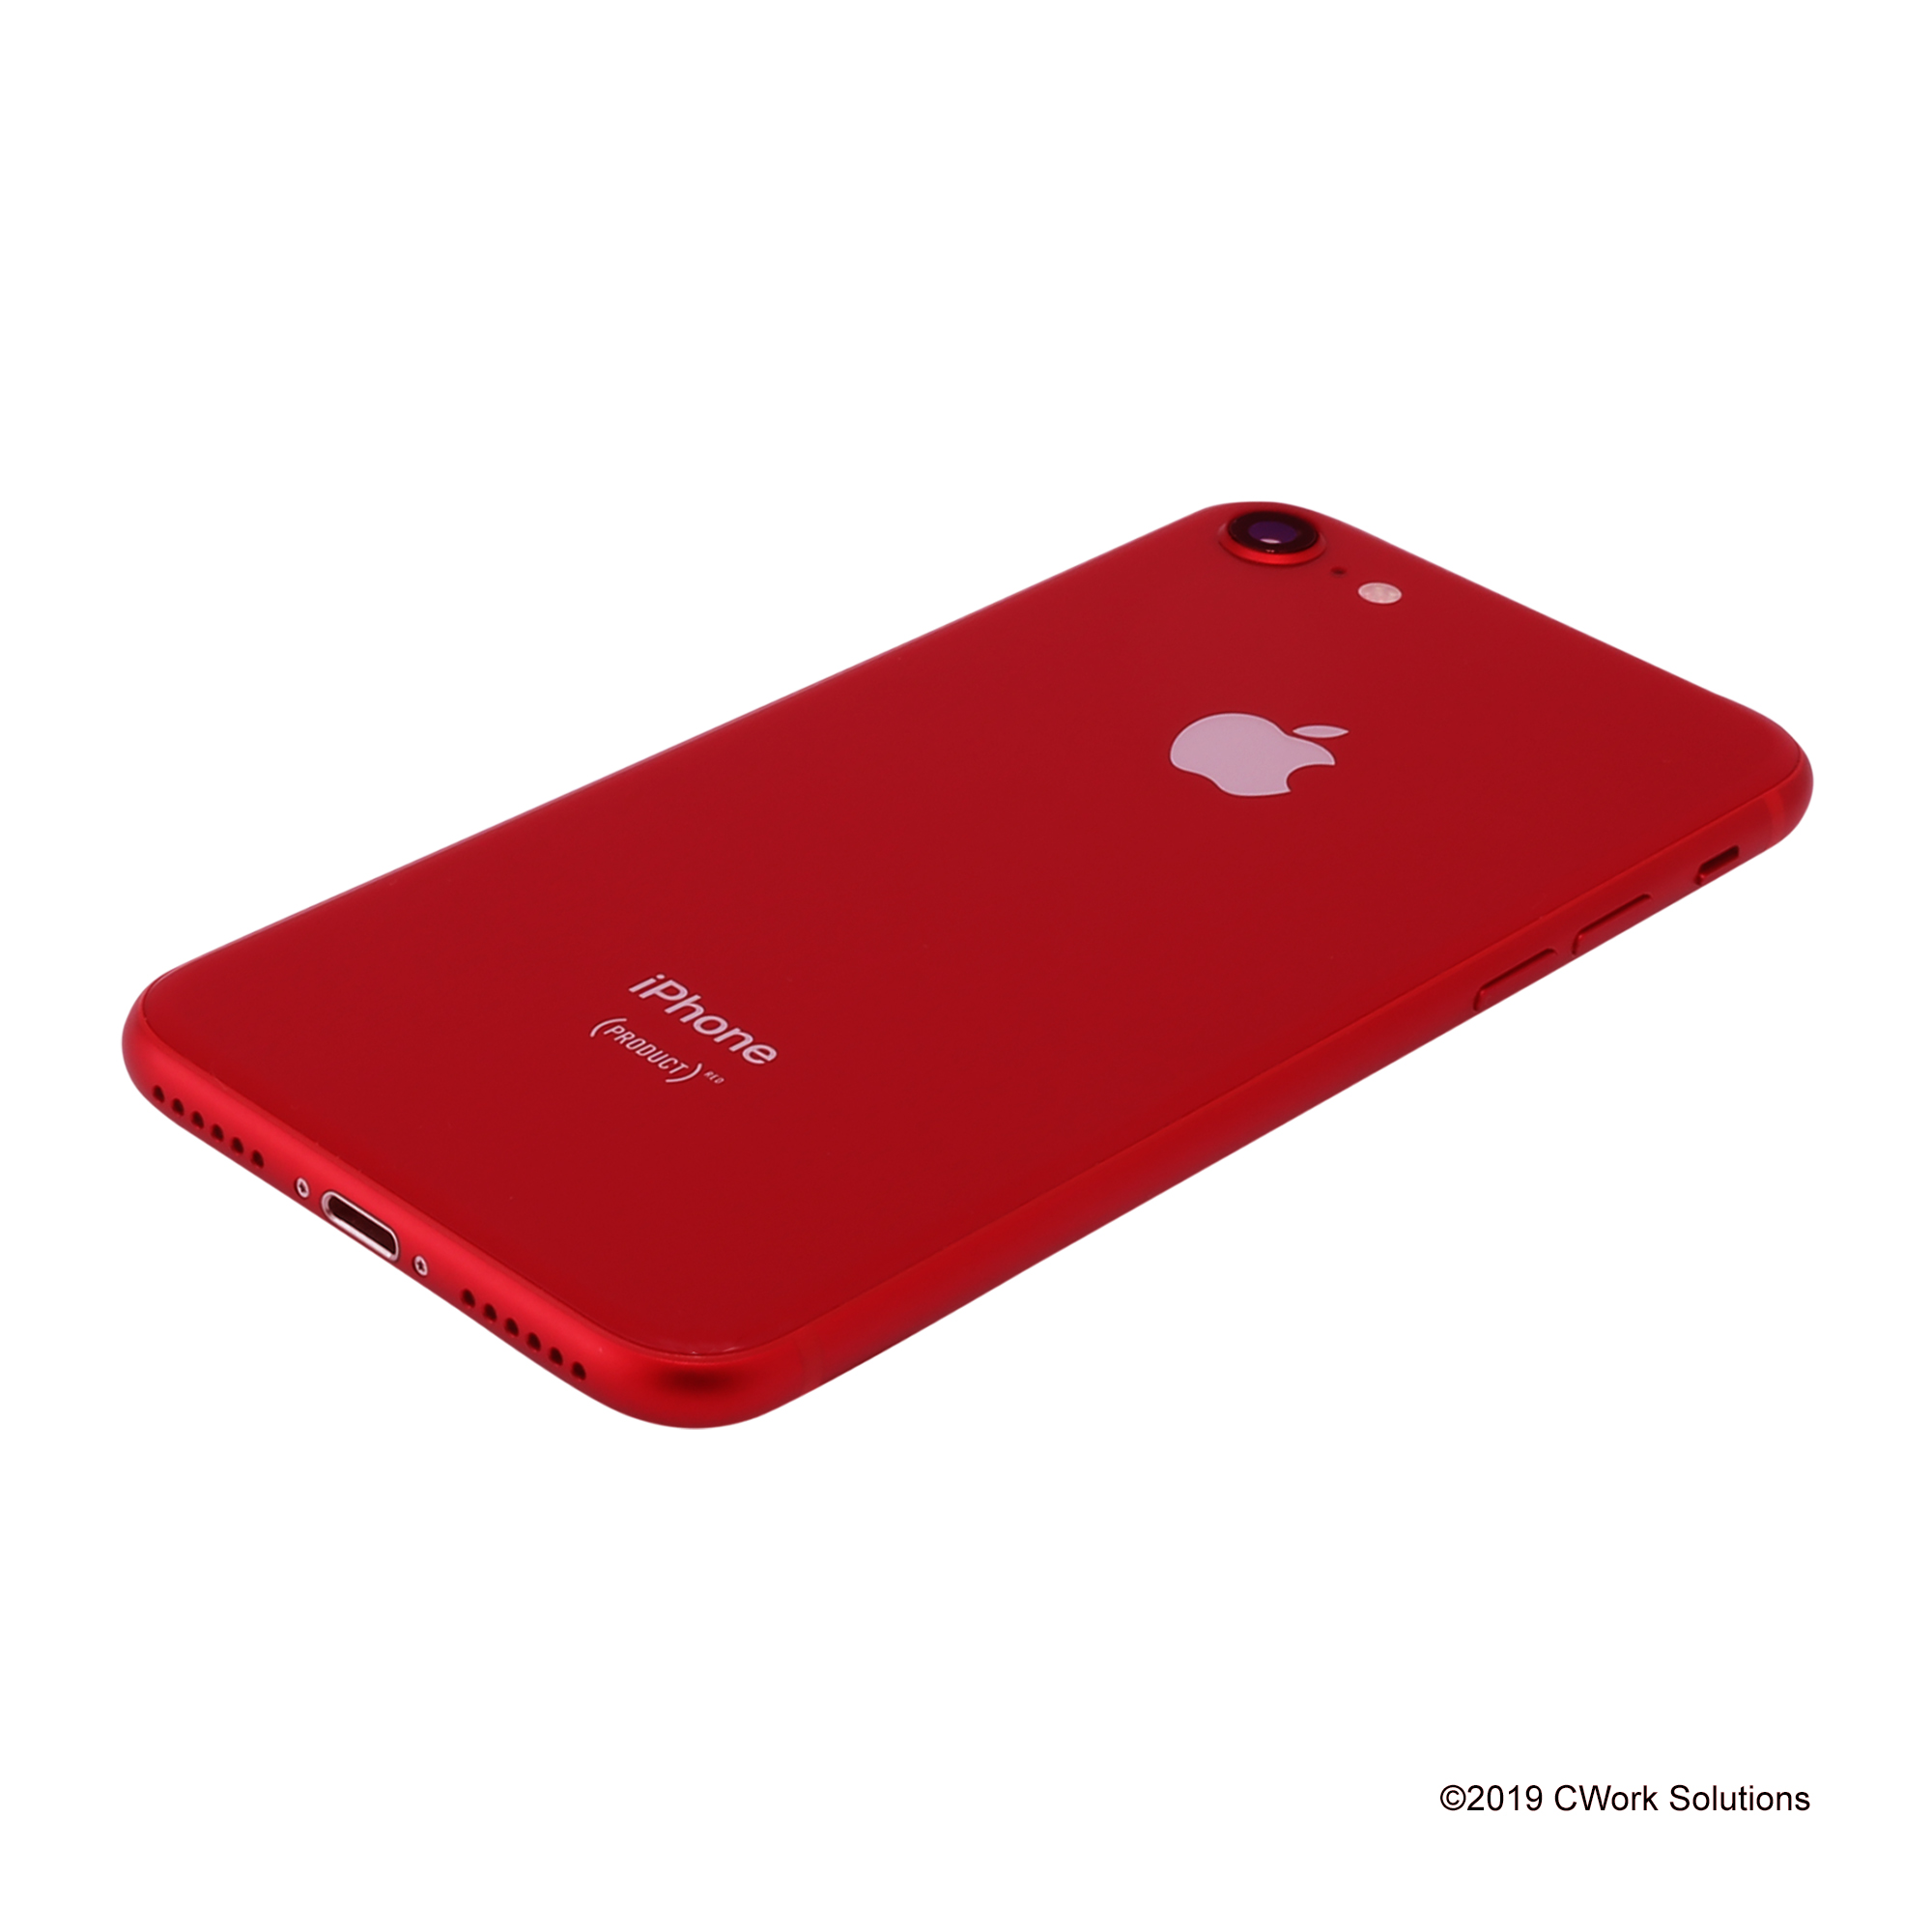 Apple-iPhone-8-a1863-64GB-Verizon-Unlocked-Excellent thumbnail 11